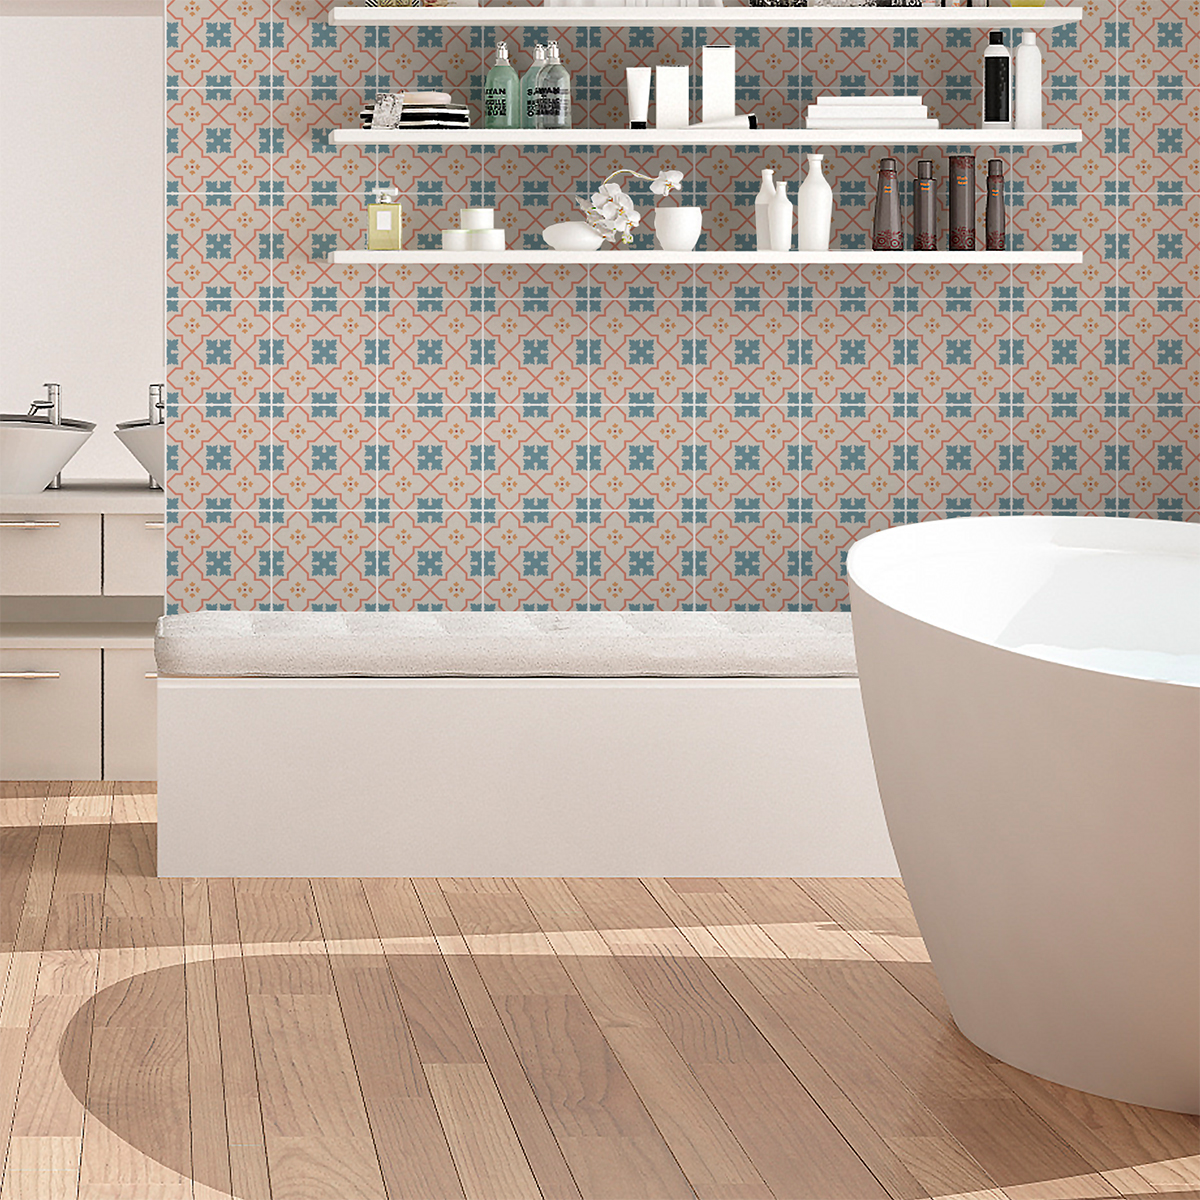 60 stickers carreaux de ciment azulejos enora cuisine. Black Bedroom Furniture Sets. Home Design Ideas